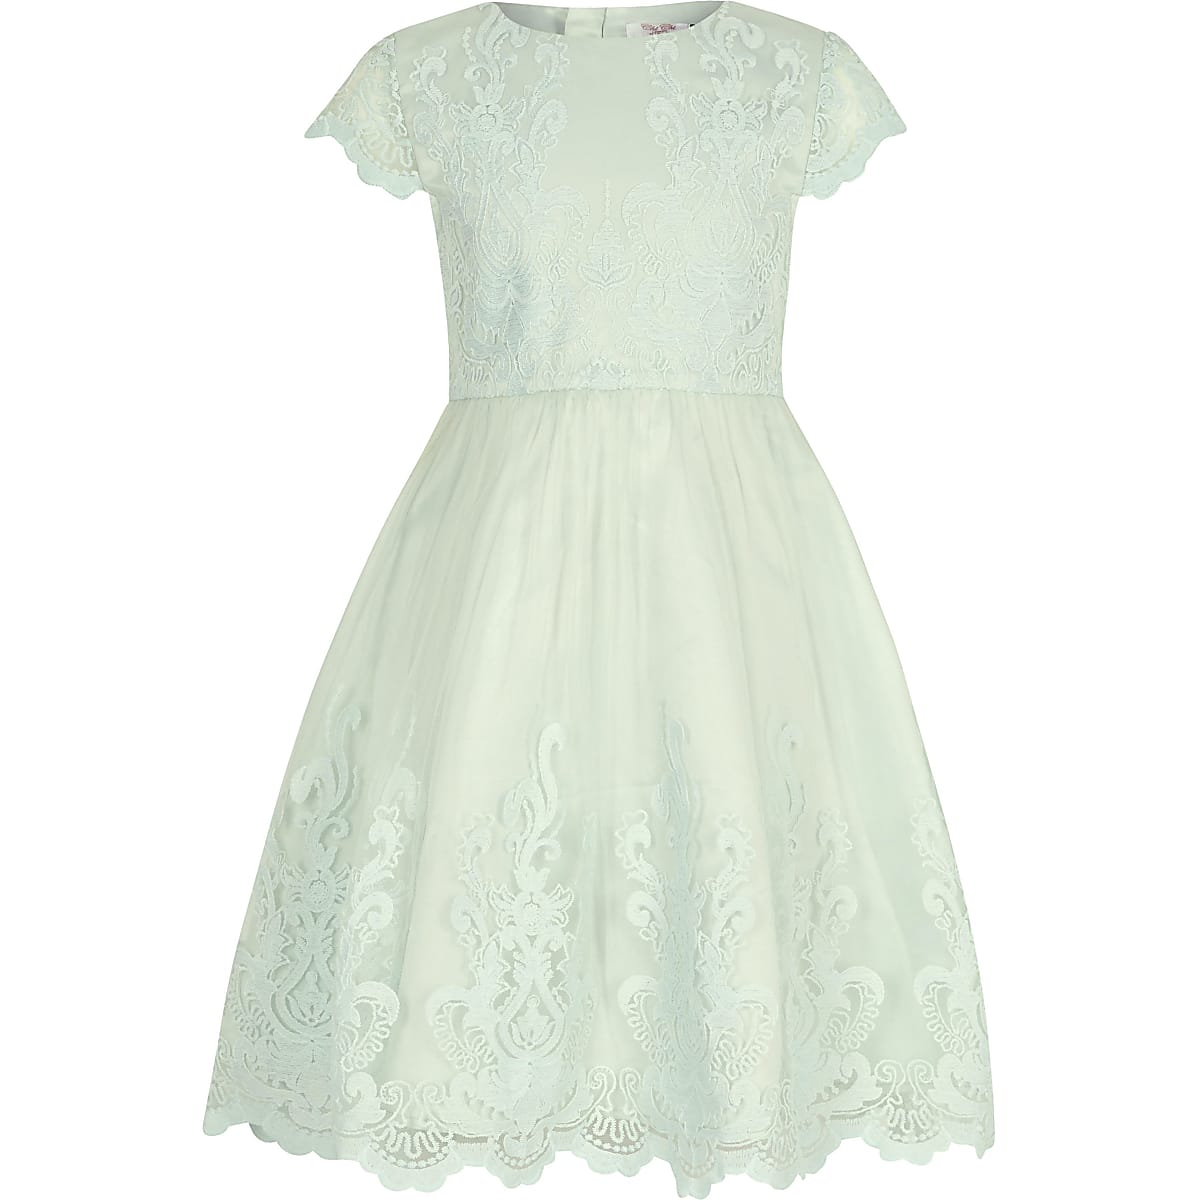 Chi Chi London - Viviana - Groene jurk voor meisjes